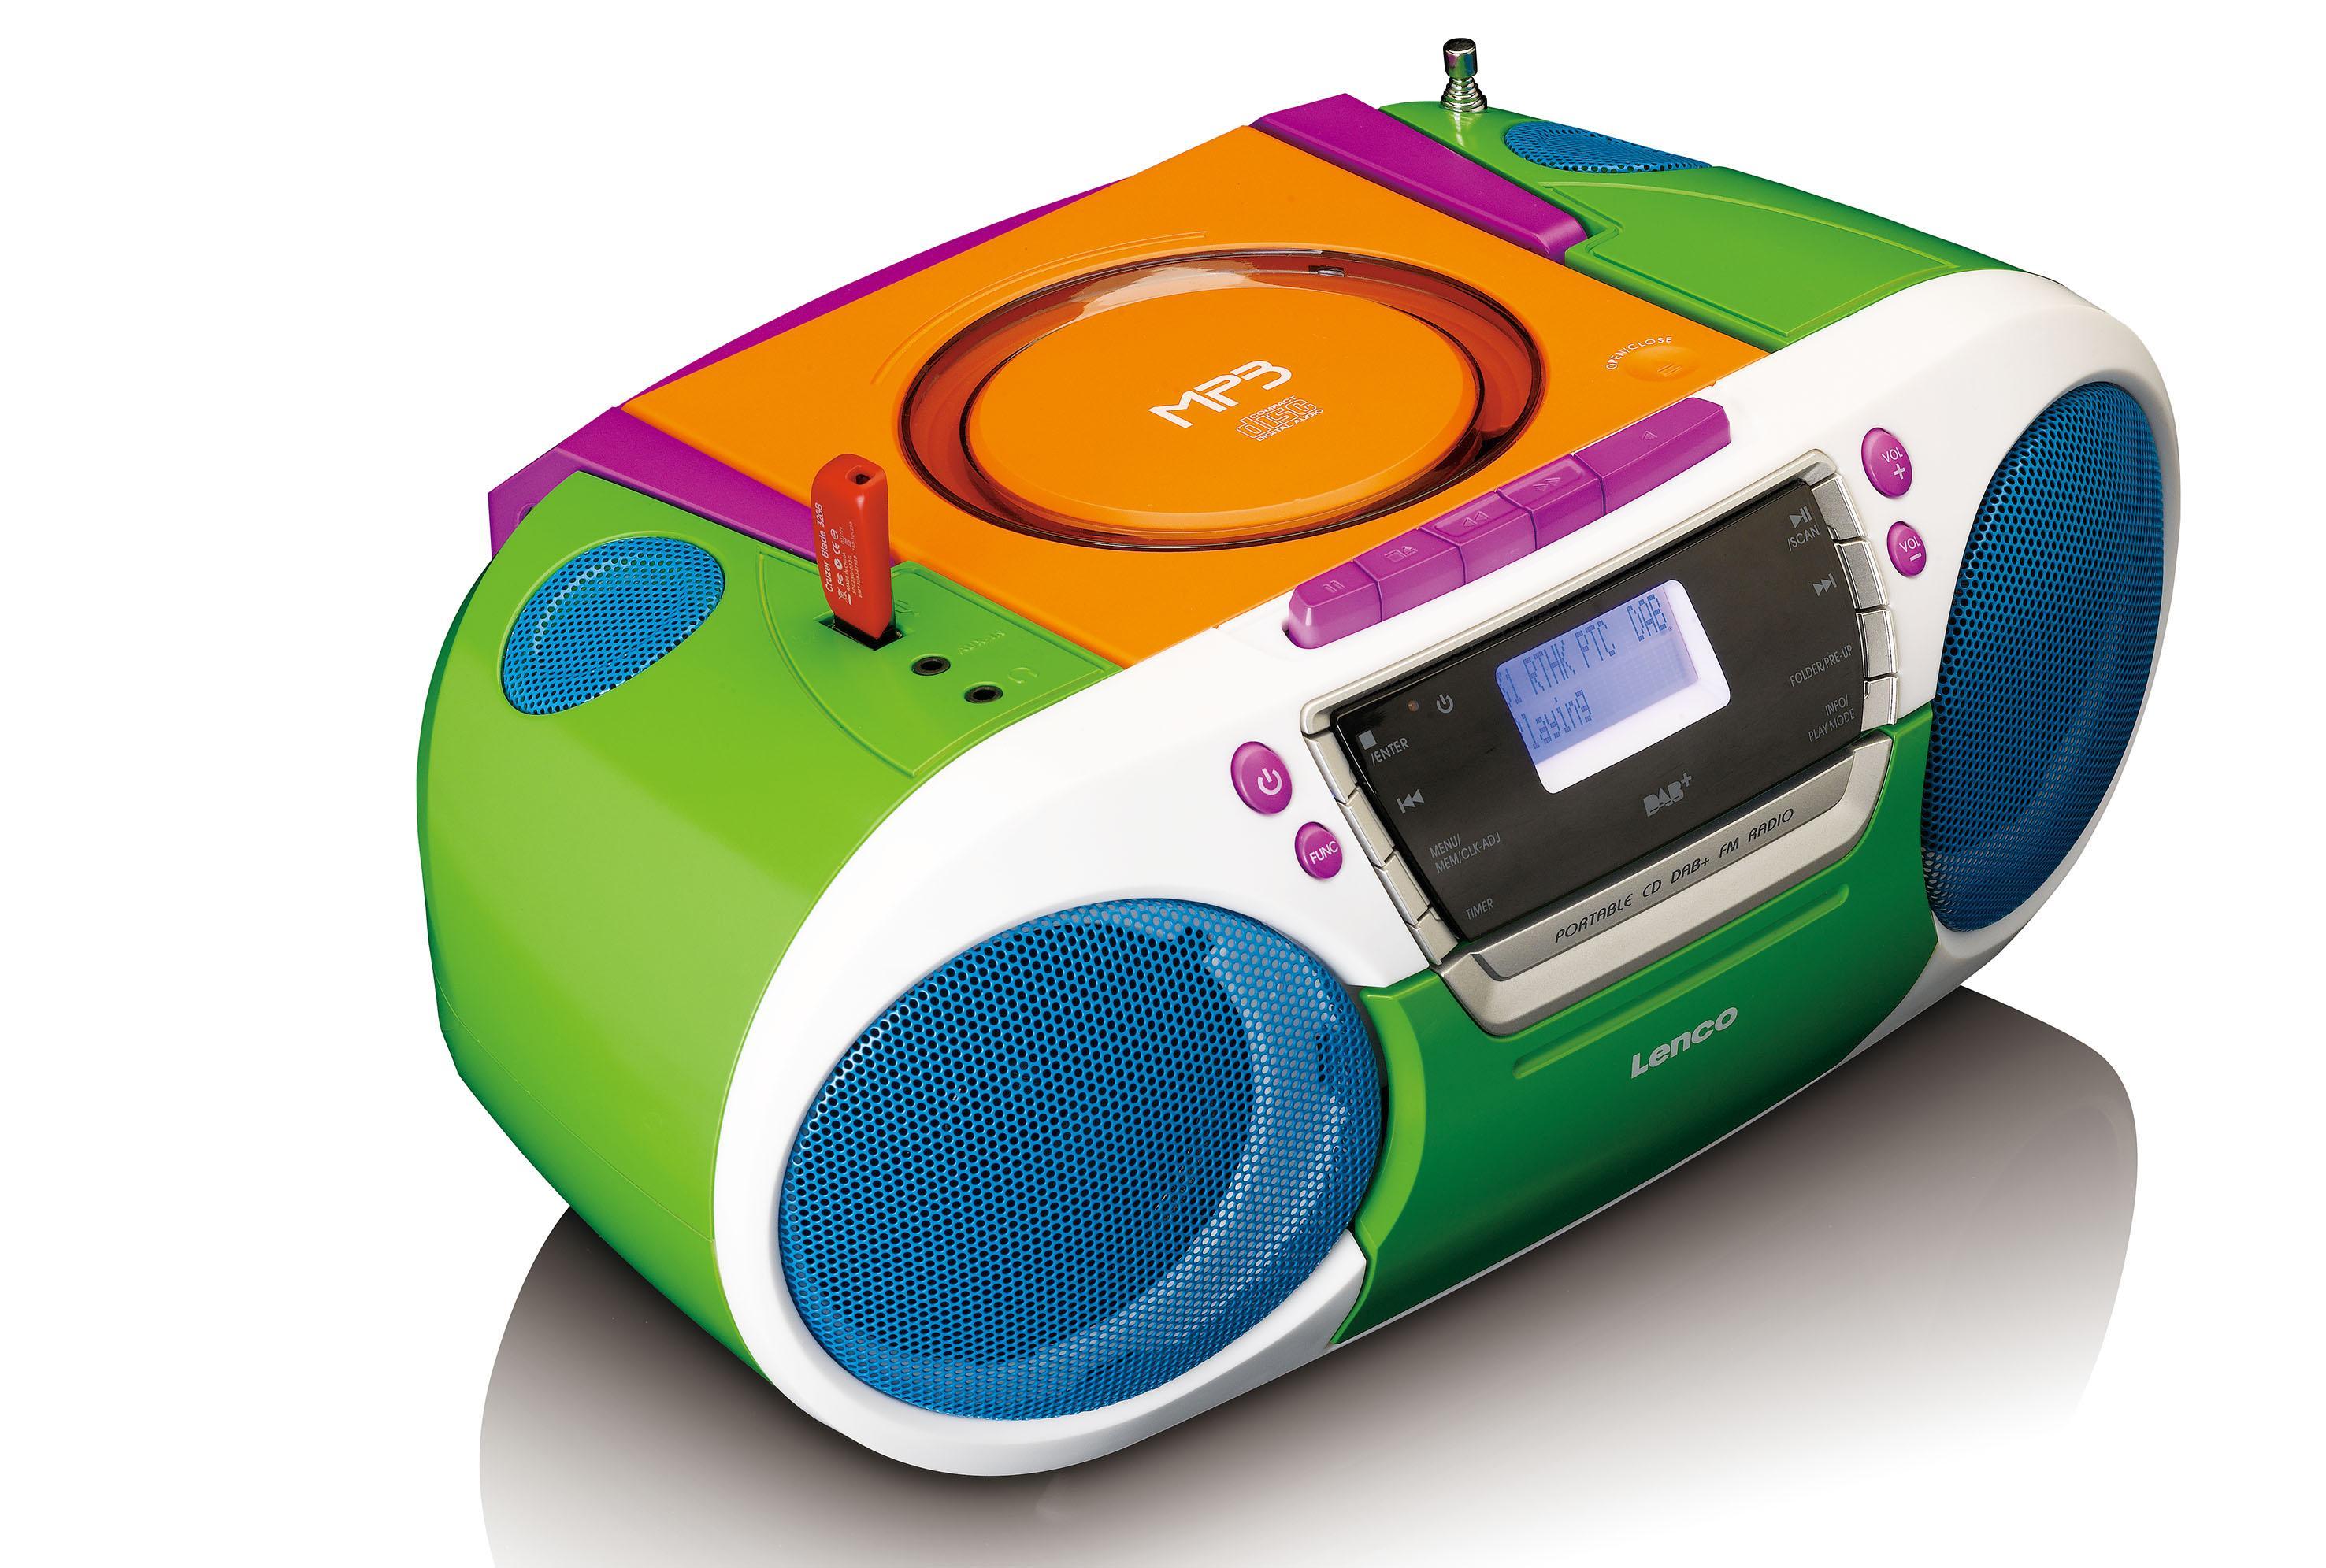 lenco digitalradio scd 681 dab mit cd player kassette und usb batteriebetrieb m glich dab. Black Bedroom Furniture Sets. Home Design Ideas